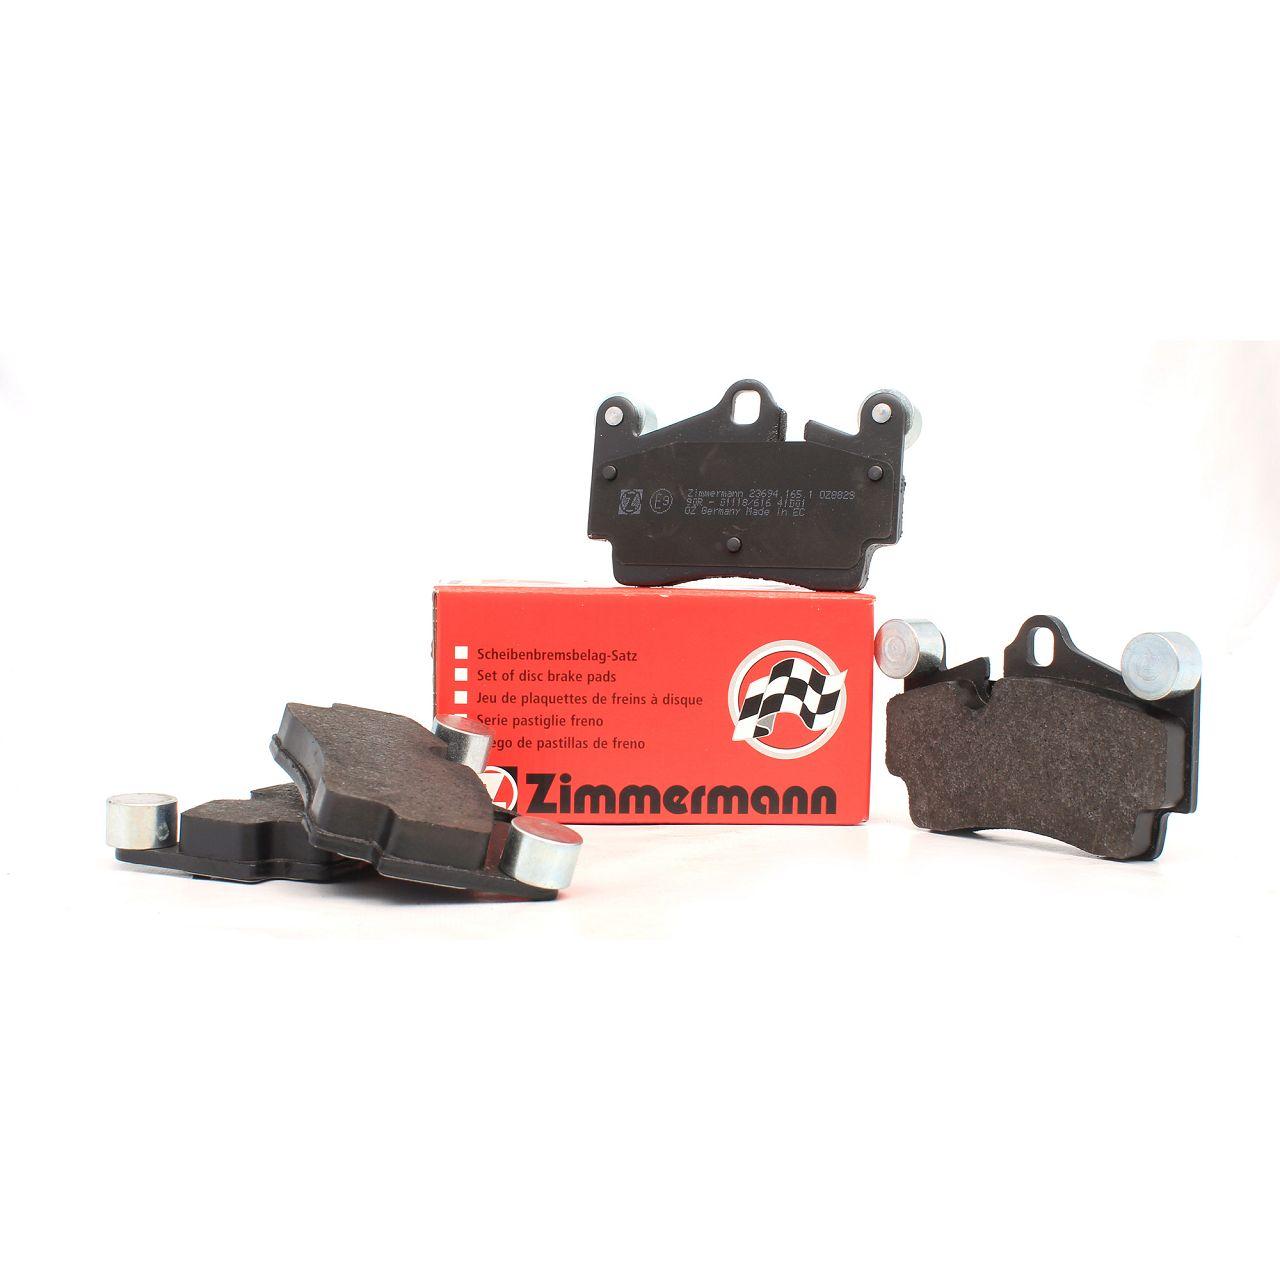 ZIMMERMANN Bremsbeläge AUDI Q7 (4L) PORSCHE Cayenne (9PA) VW Touareg (7L) hinten